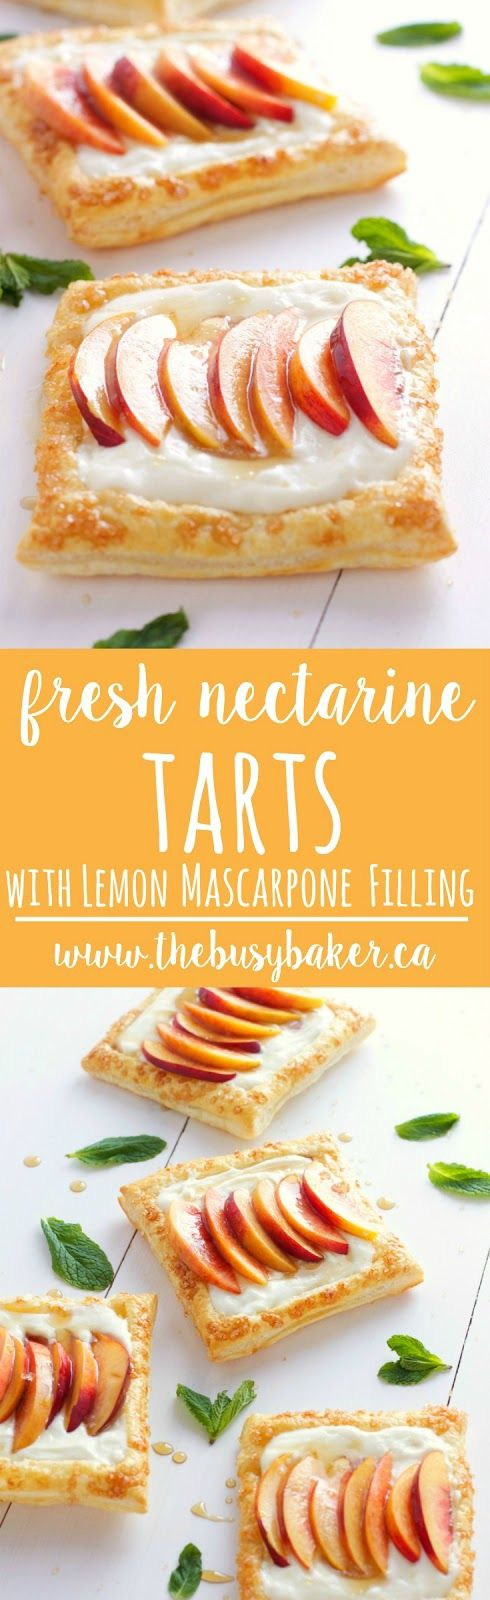 ... Tarts on Pinterest | Pear tart, Goats cheese tart and Goat cheese